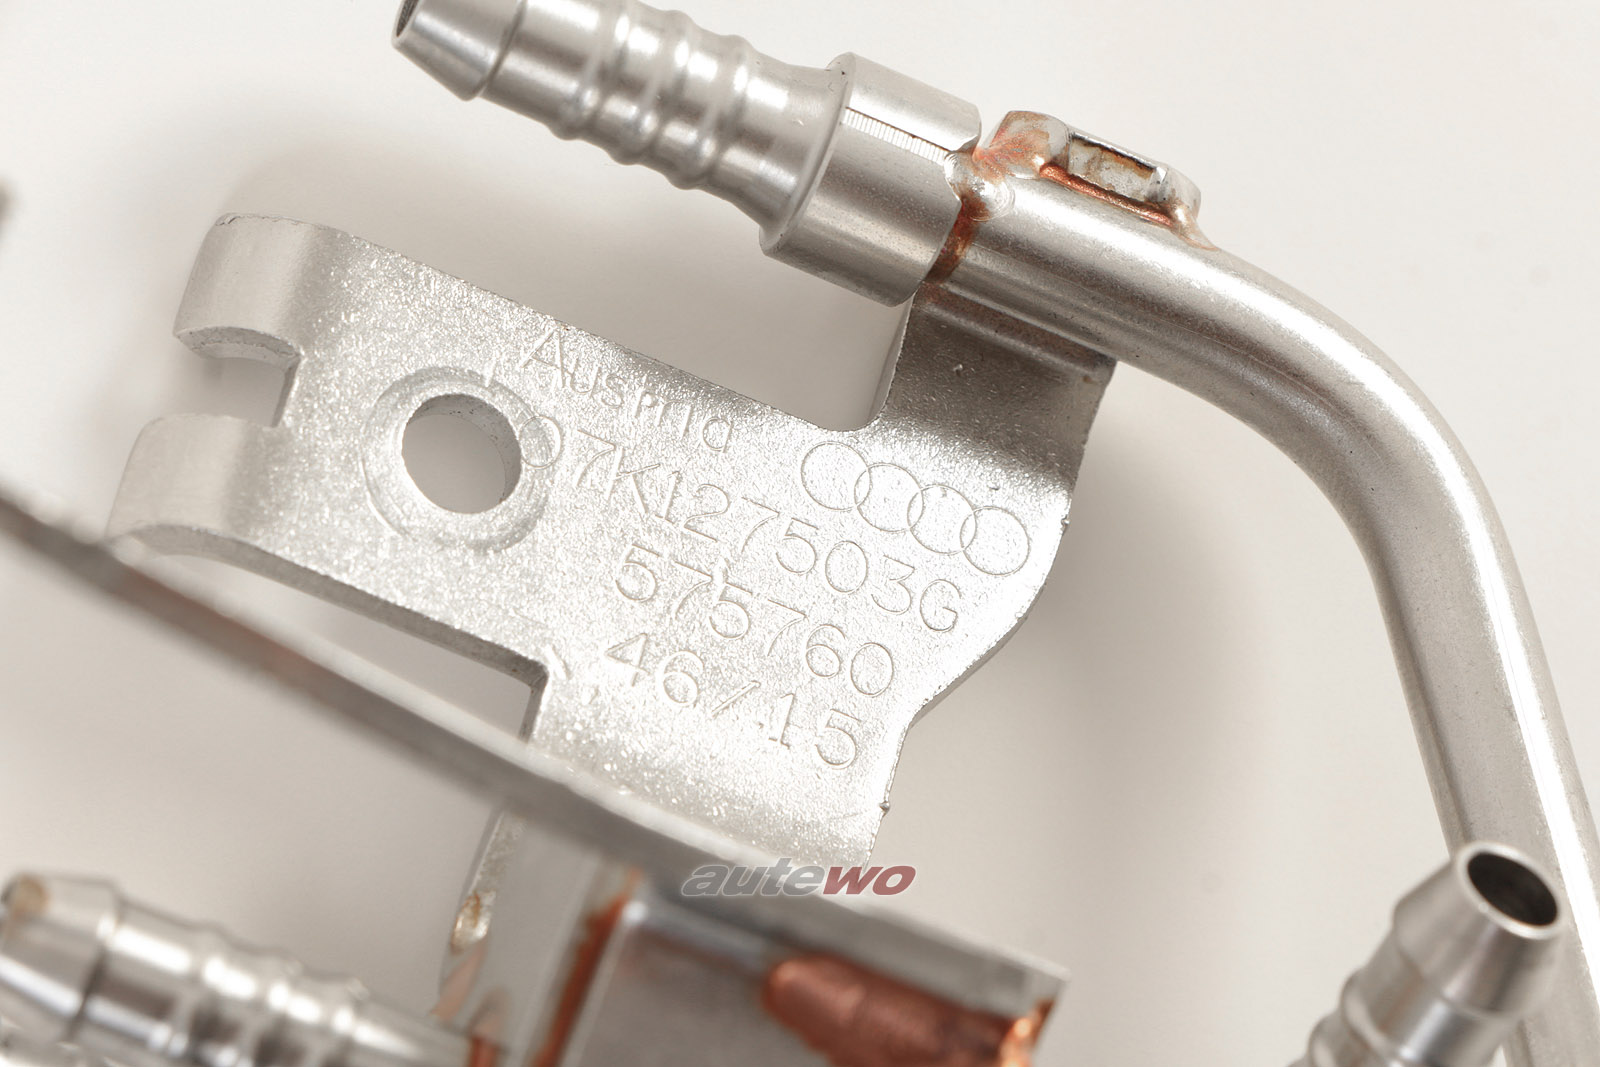 07K127503E 07K127503G NEU Audi RS3 8V 2.5l TFSI Kraftstoffverteiler